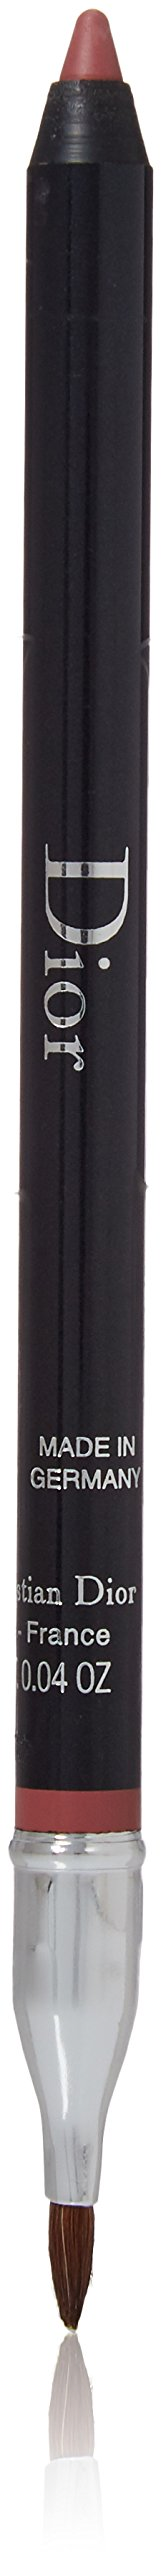 Christian Dior Contour Lip Liner Pencil Grege for Women, 0.04 Ounce